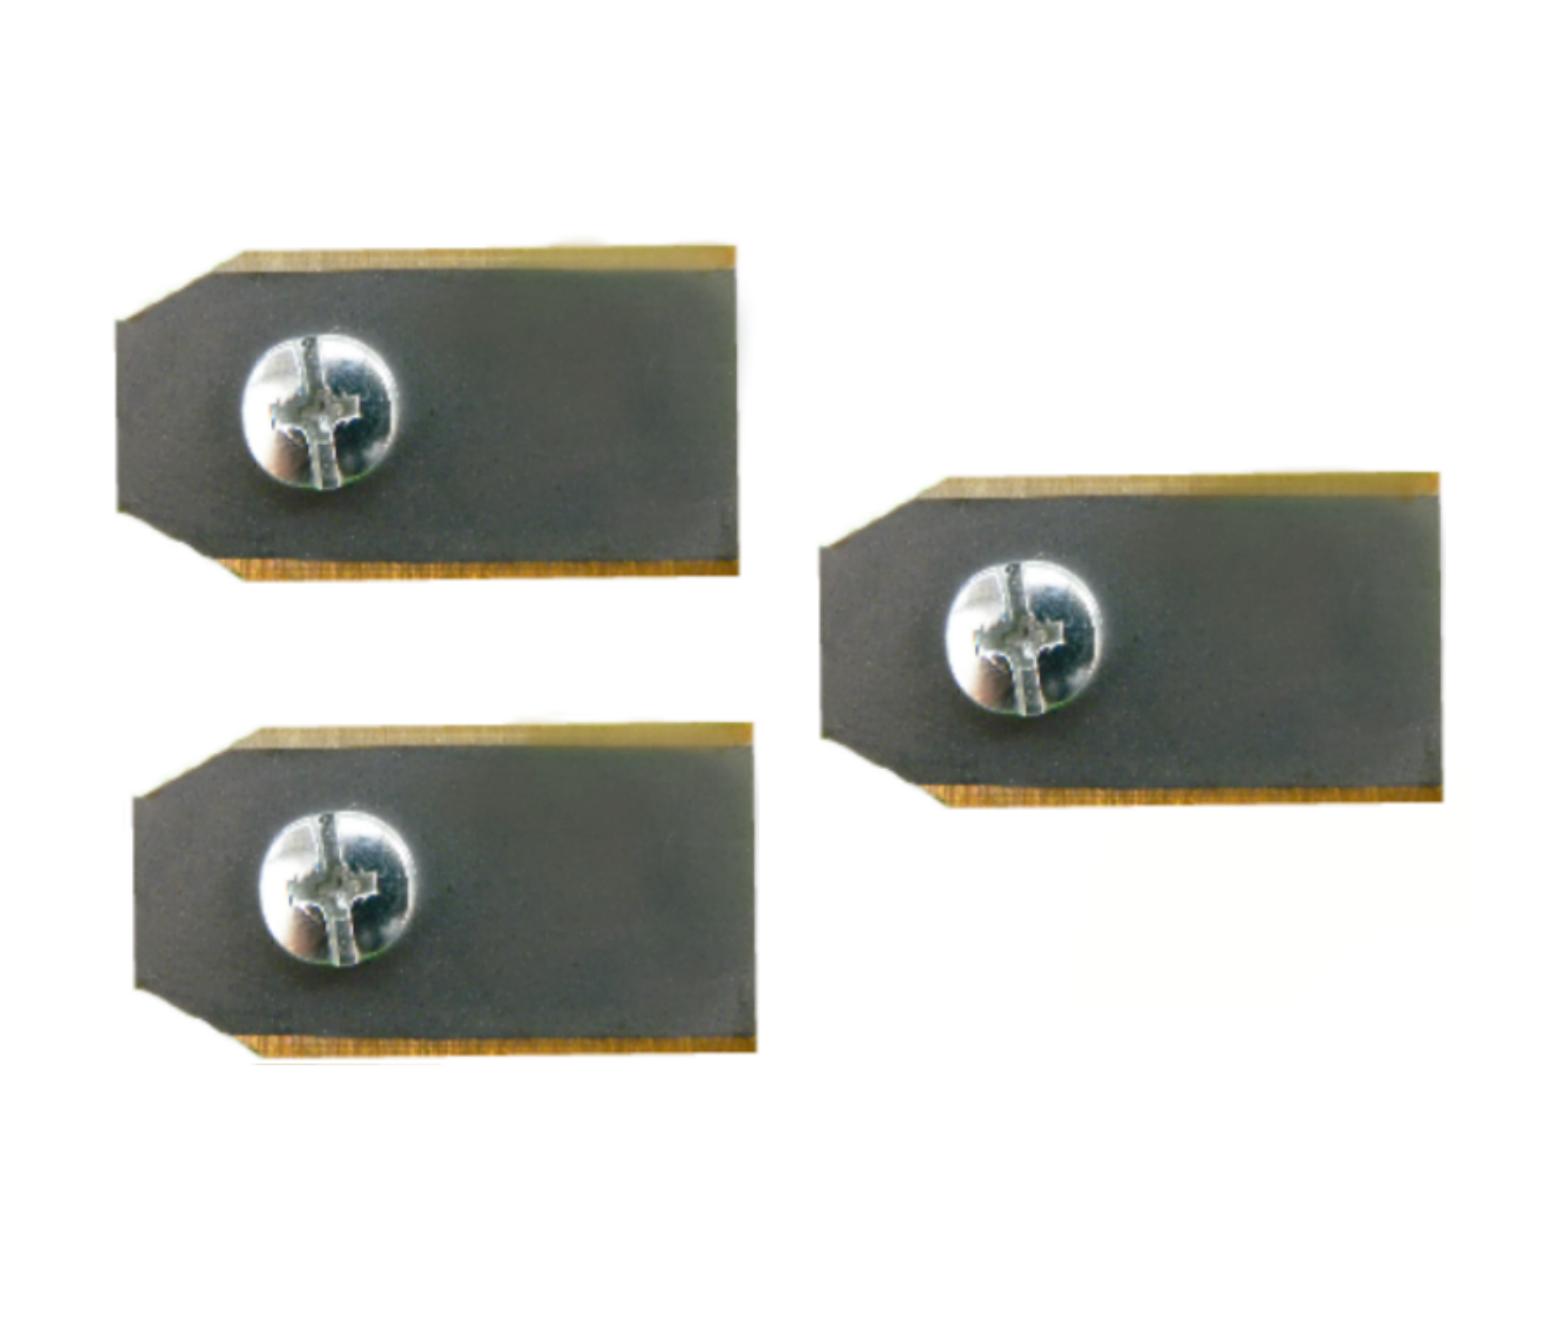 3 titanium Husqvarna mesjes